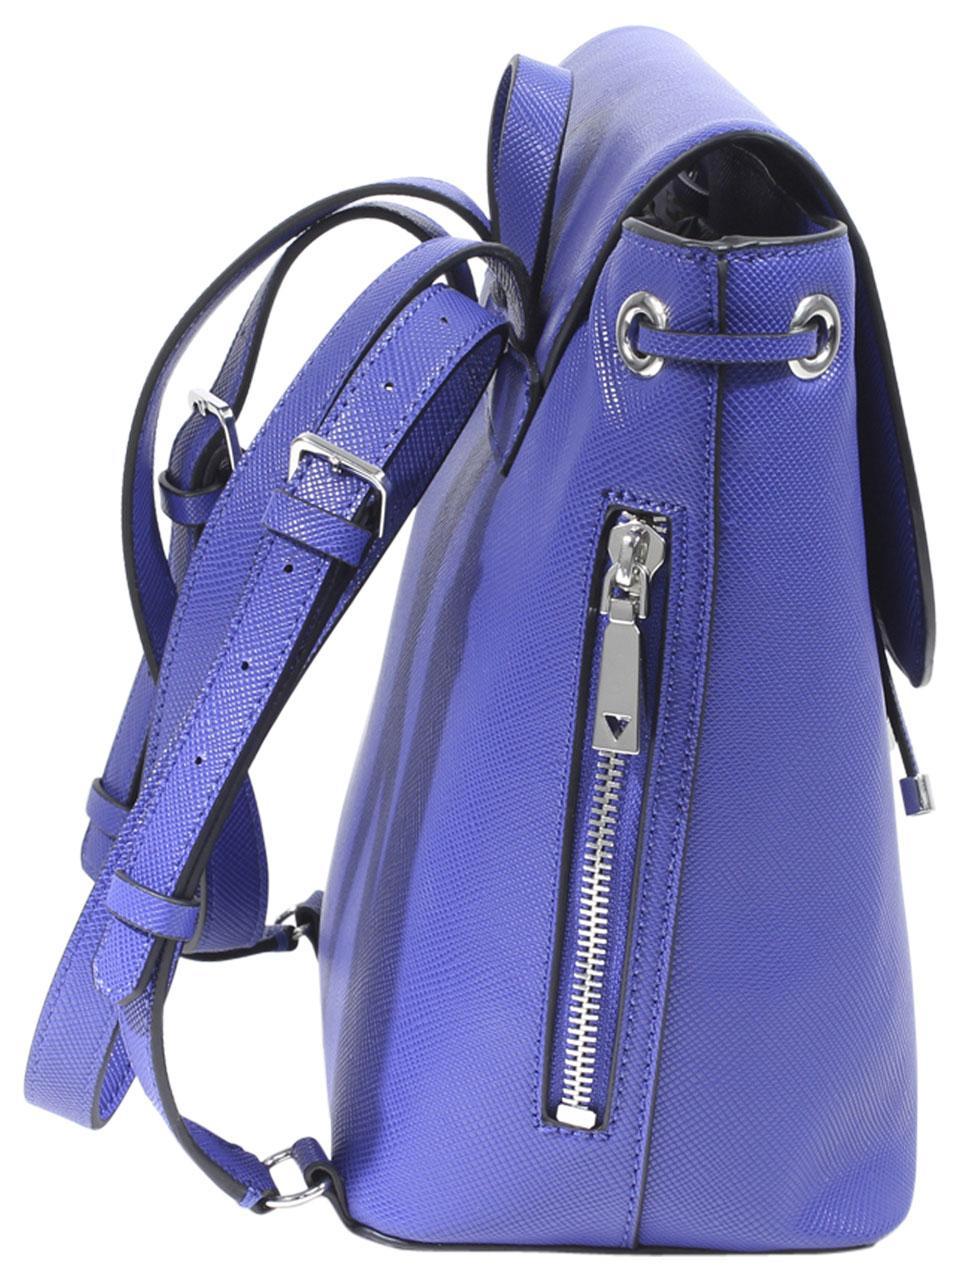 Guess-Women-039-s-Varsity-Pop-Pin-Up-Backpack-Bag thumbnail 12